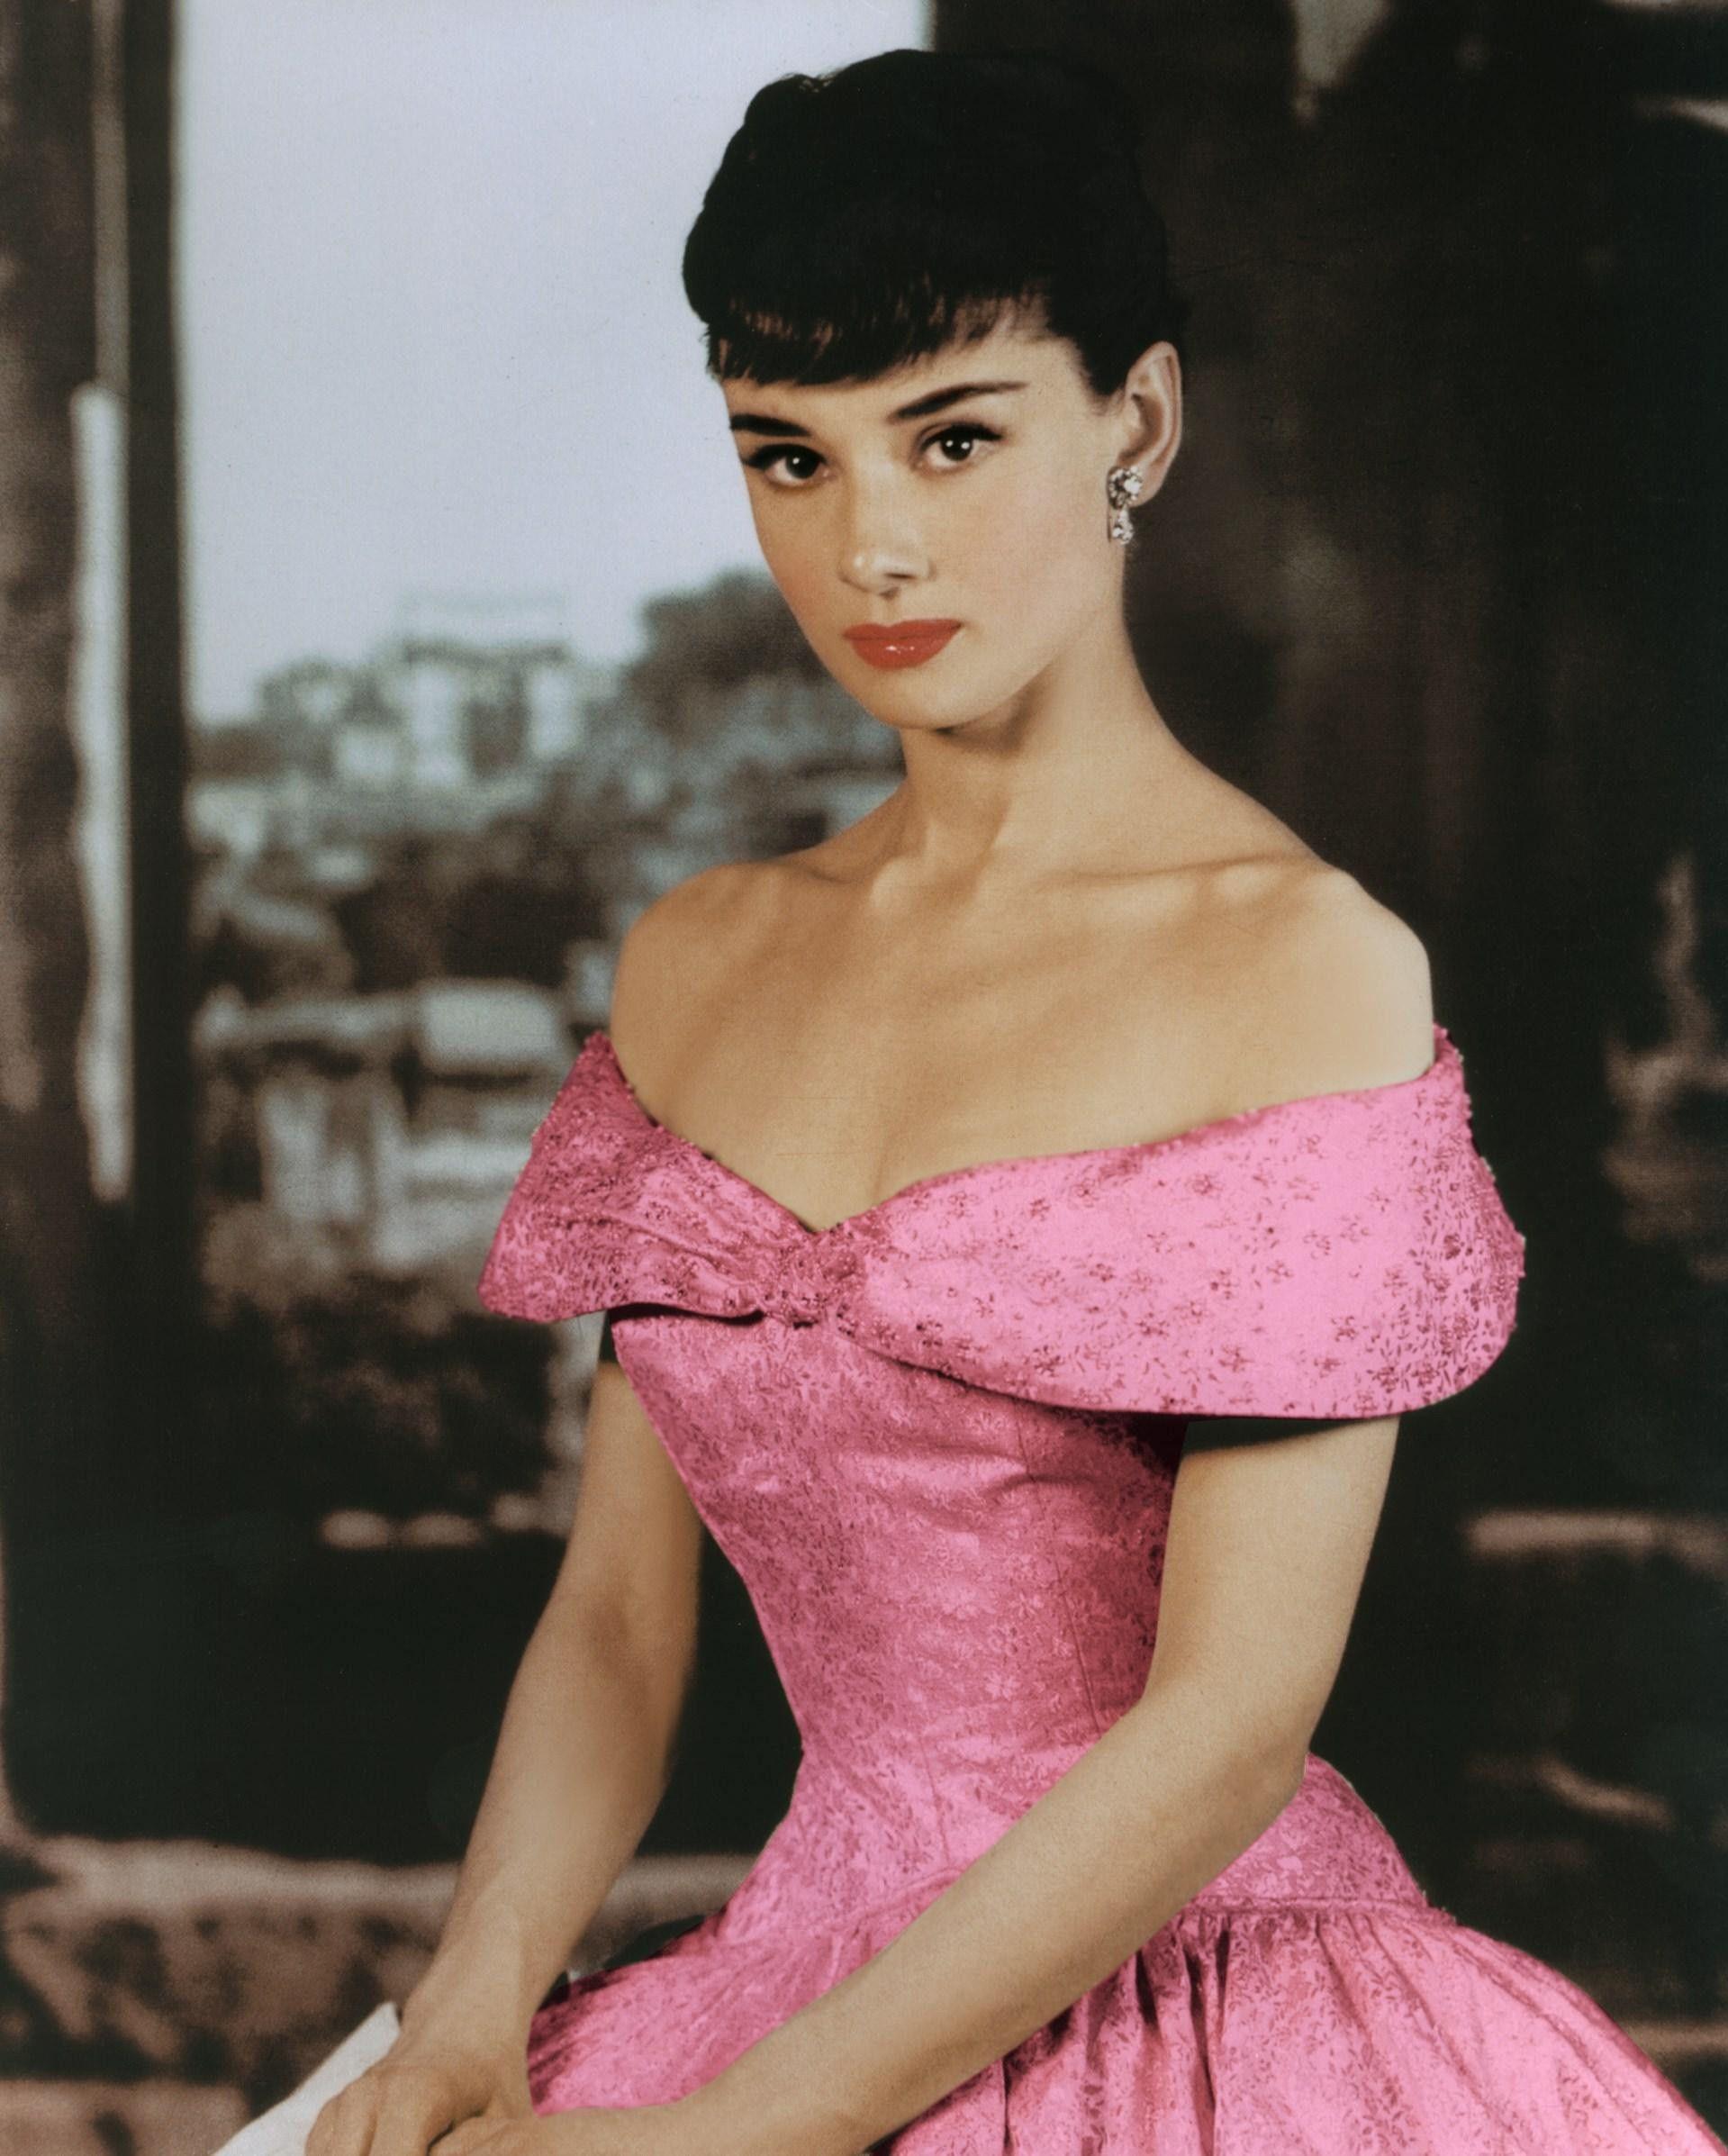 Audrey Hepburn hot pink dress Imgur | Audrey Hepburn | Pinterest ...